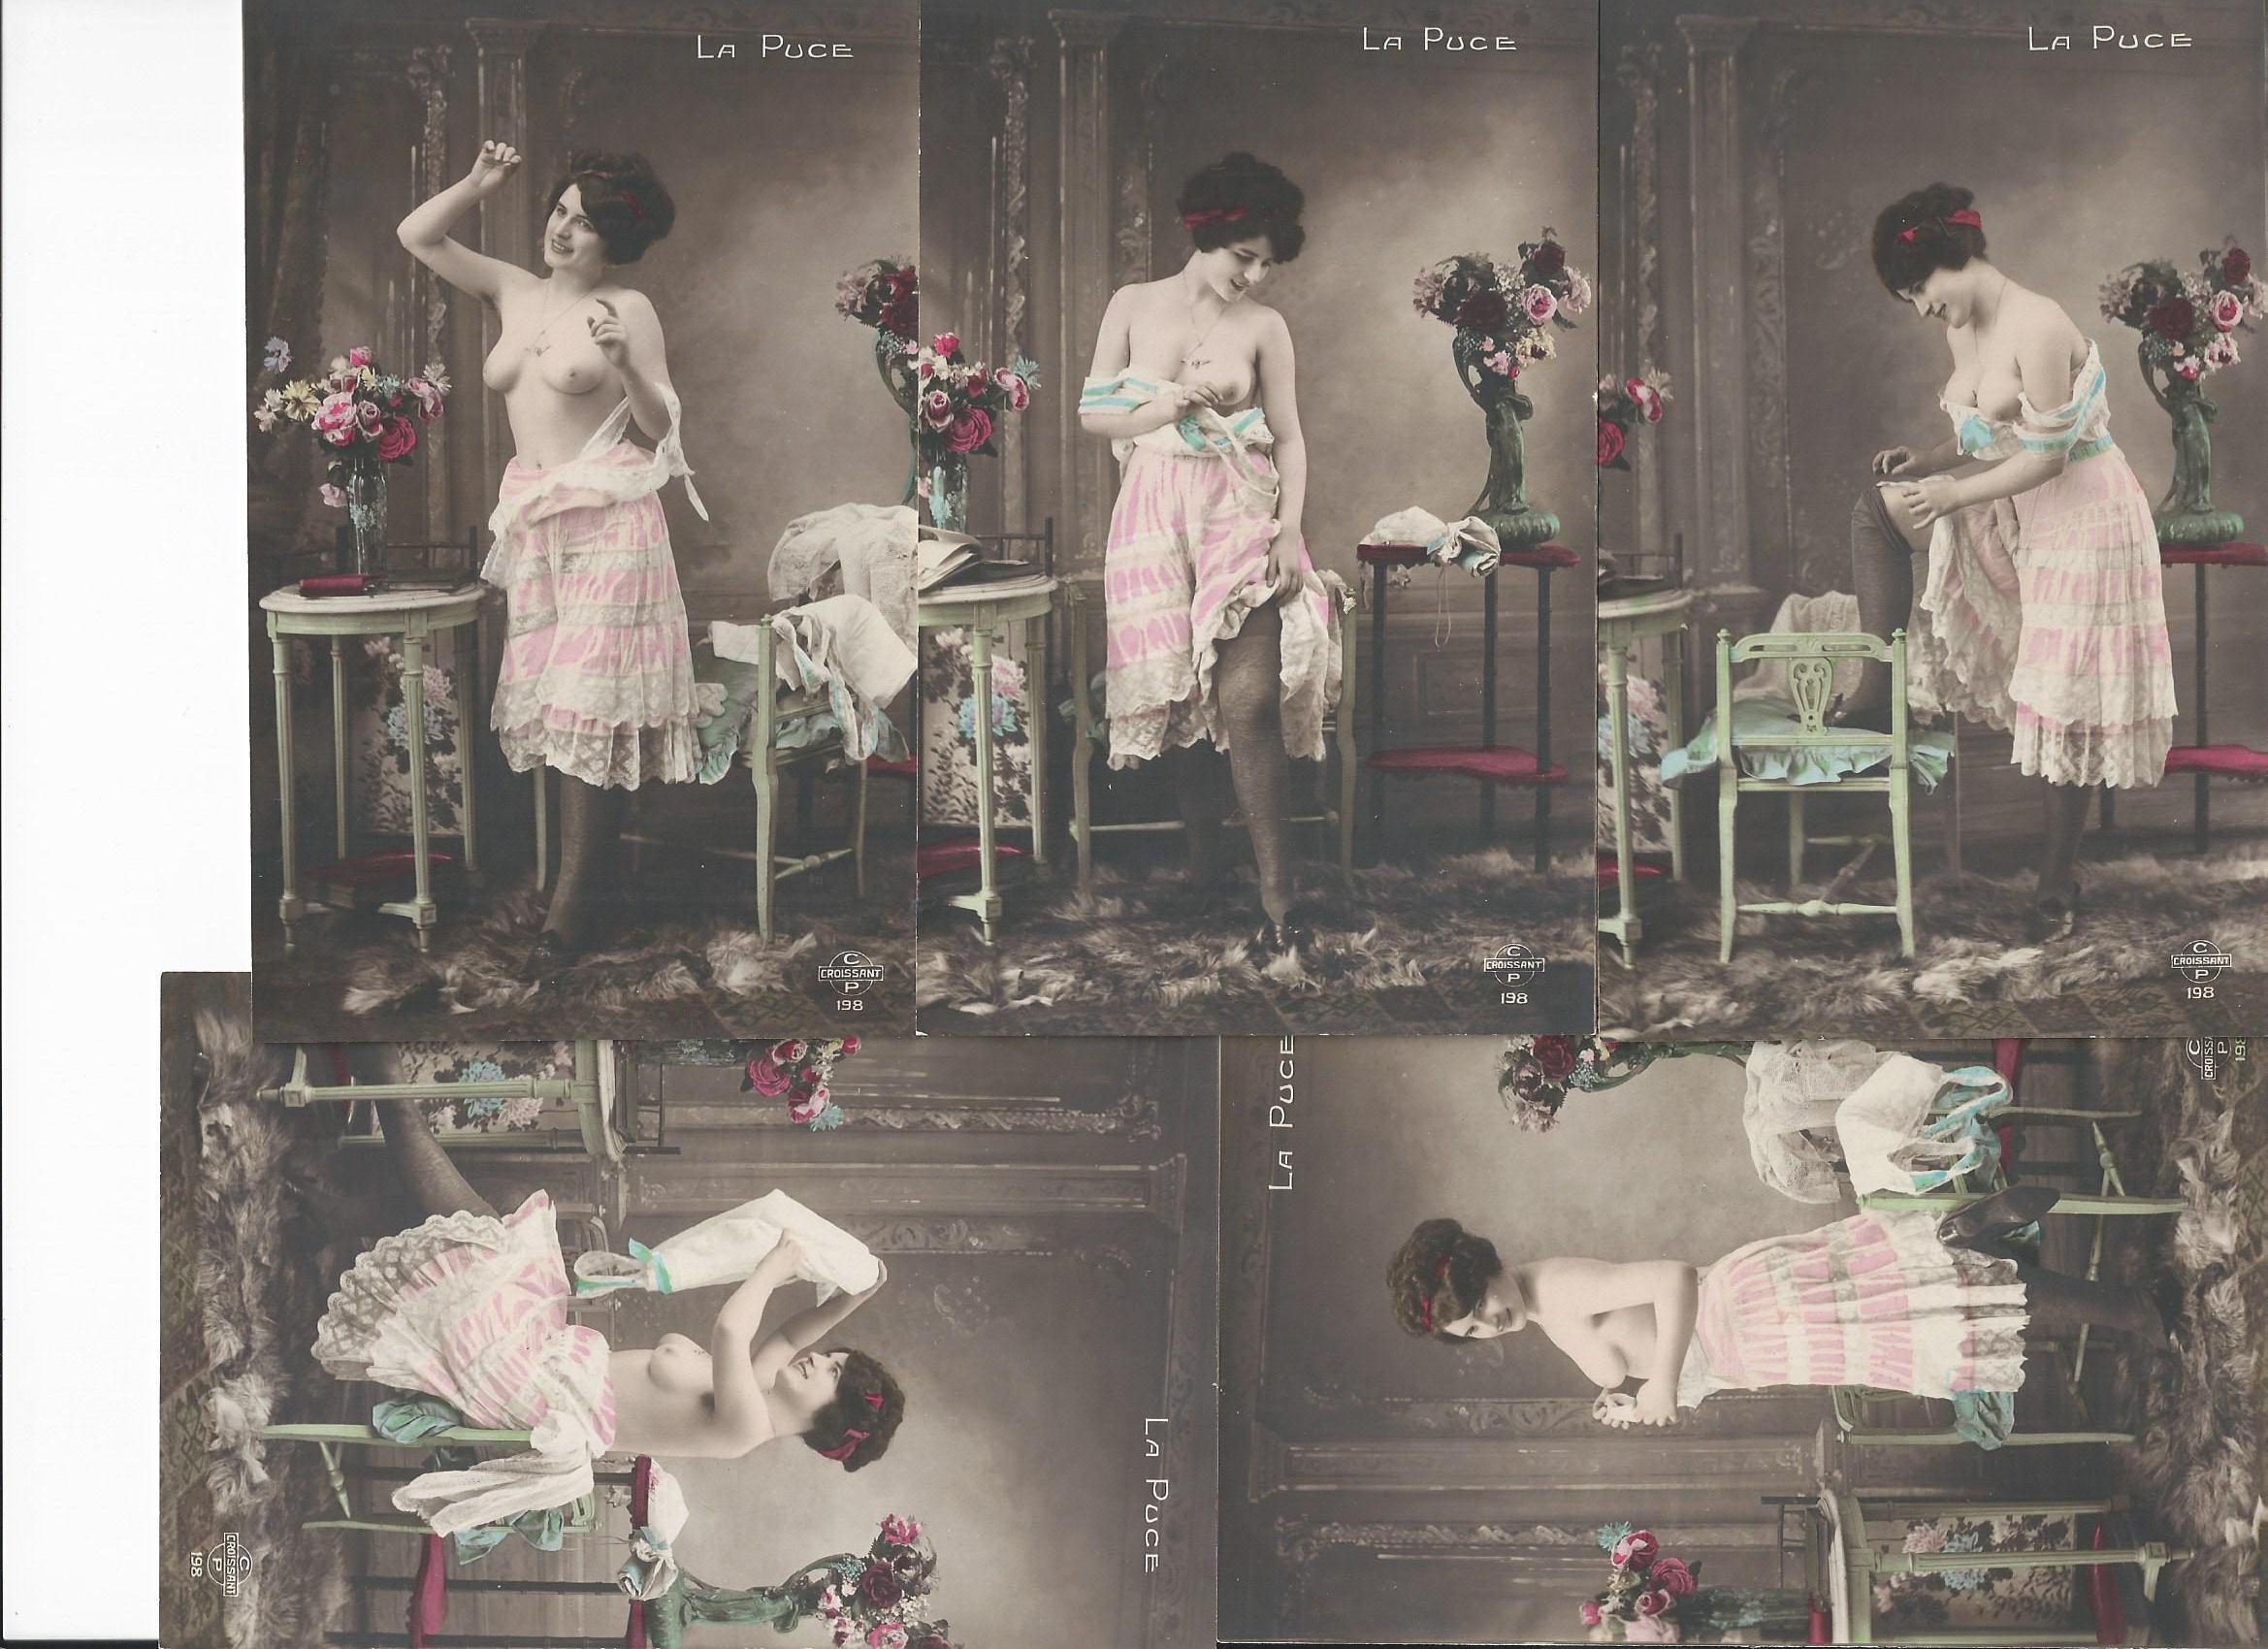 rotique Le Cabinet de Curiosits de Madeleine Miranda